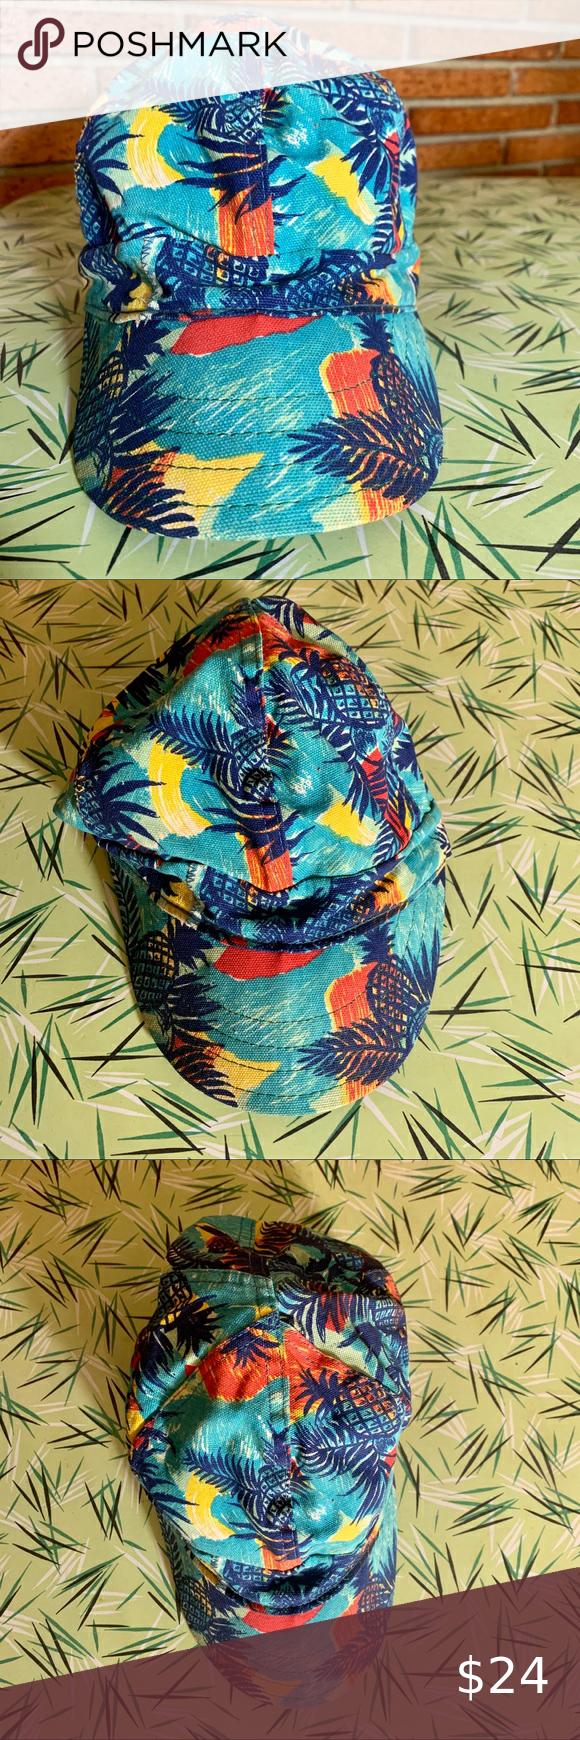 Vintage Kromer Tropical Teal Cap Hat Size 7 3 8 In 2020 Hat Sizes Hats Vintage Vintage